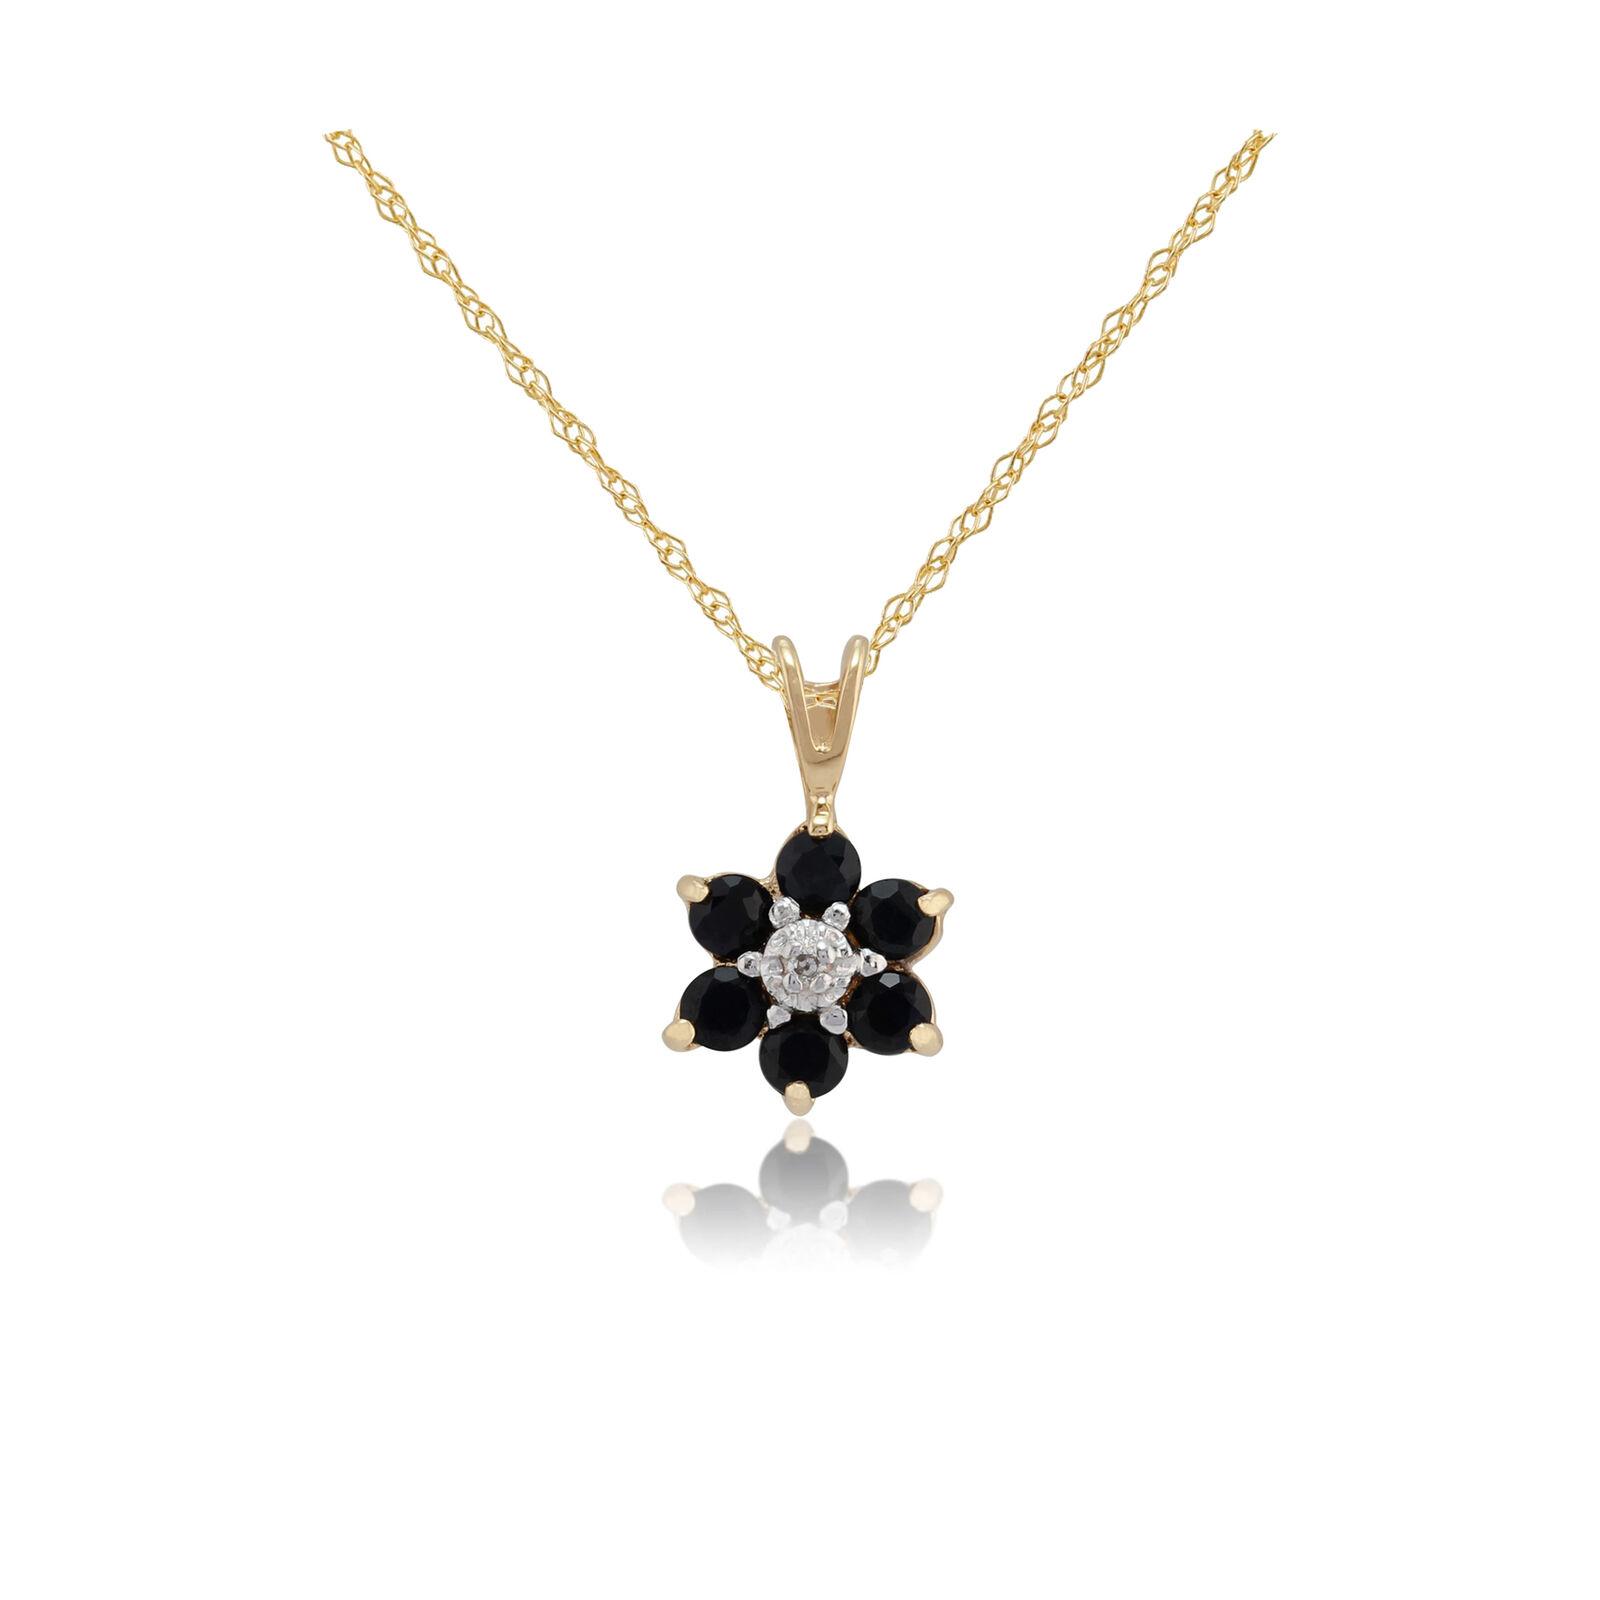 9ct Yellow gold 0.55ct Sapphire & Diamond Cluster Pendant on Chain